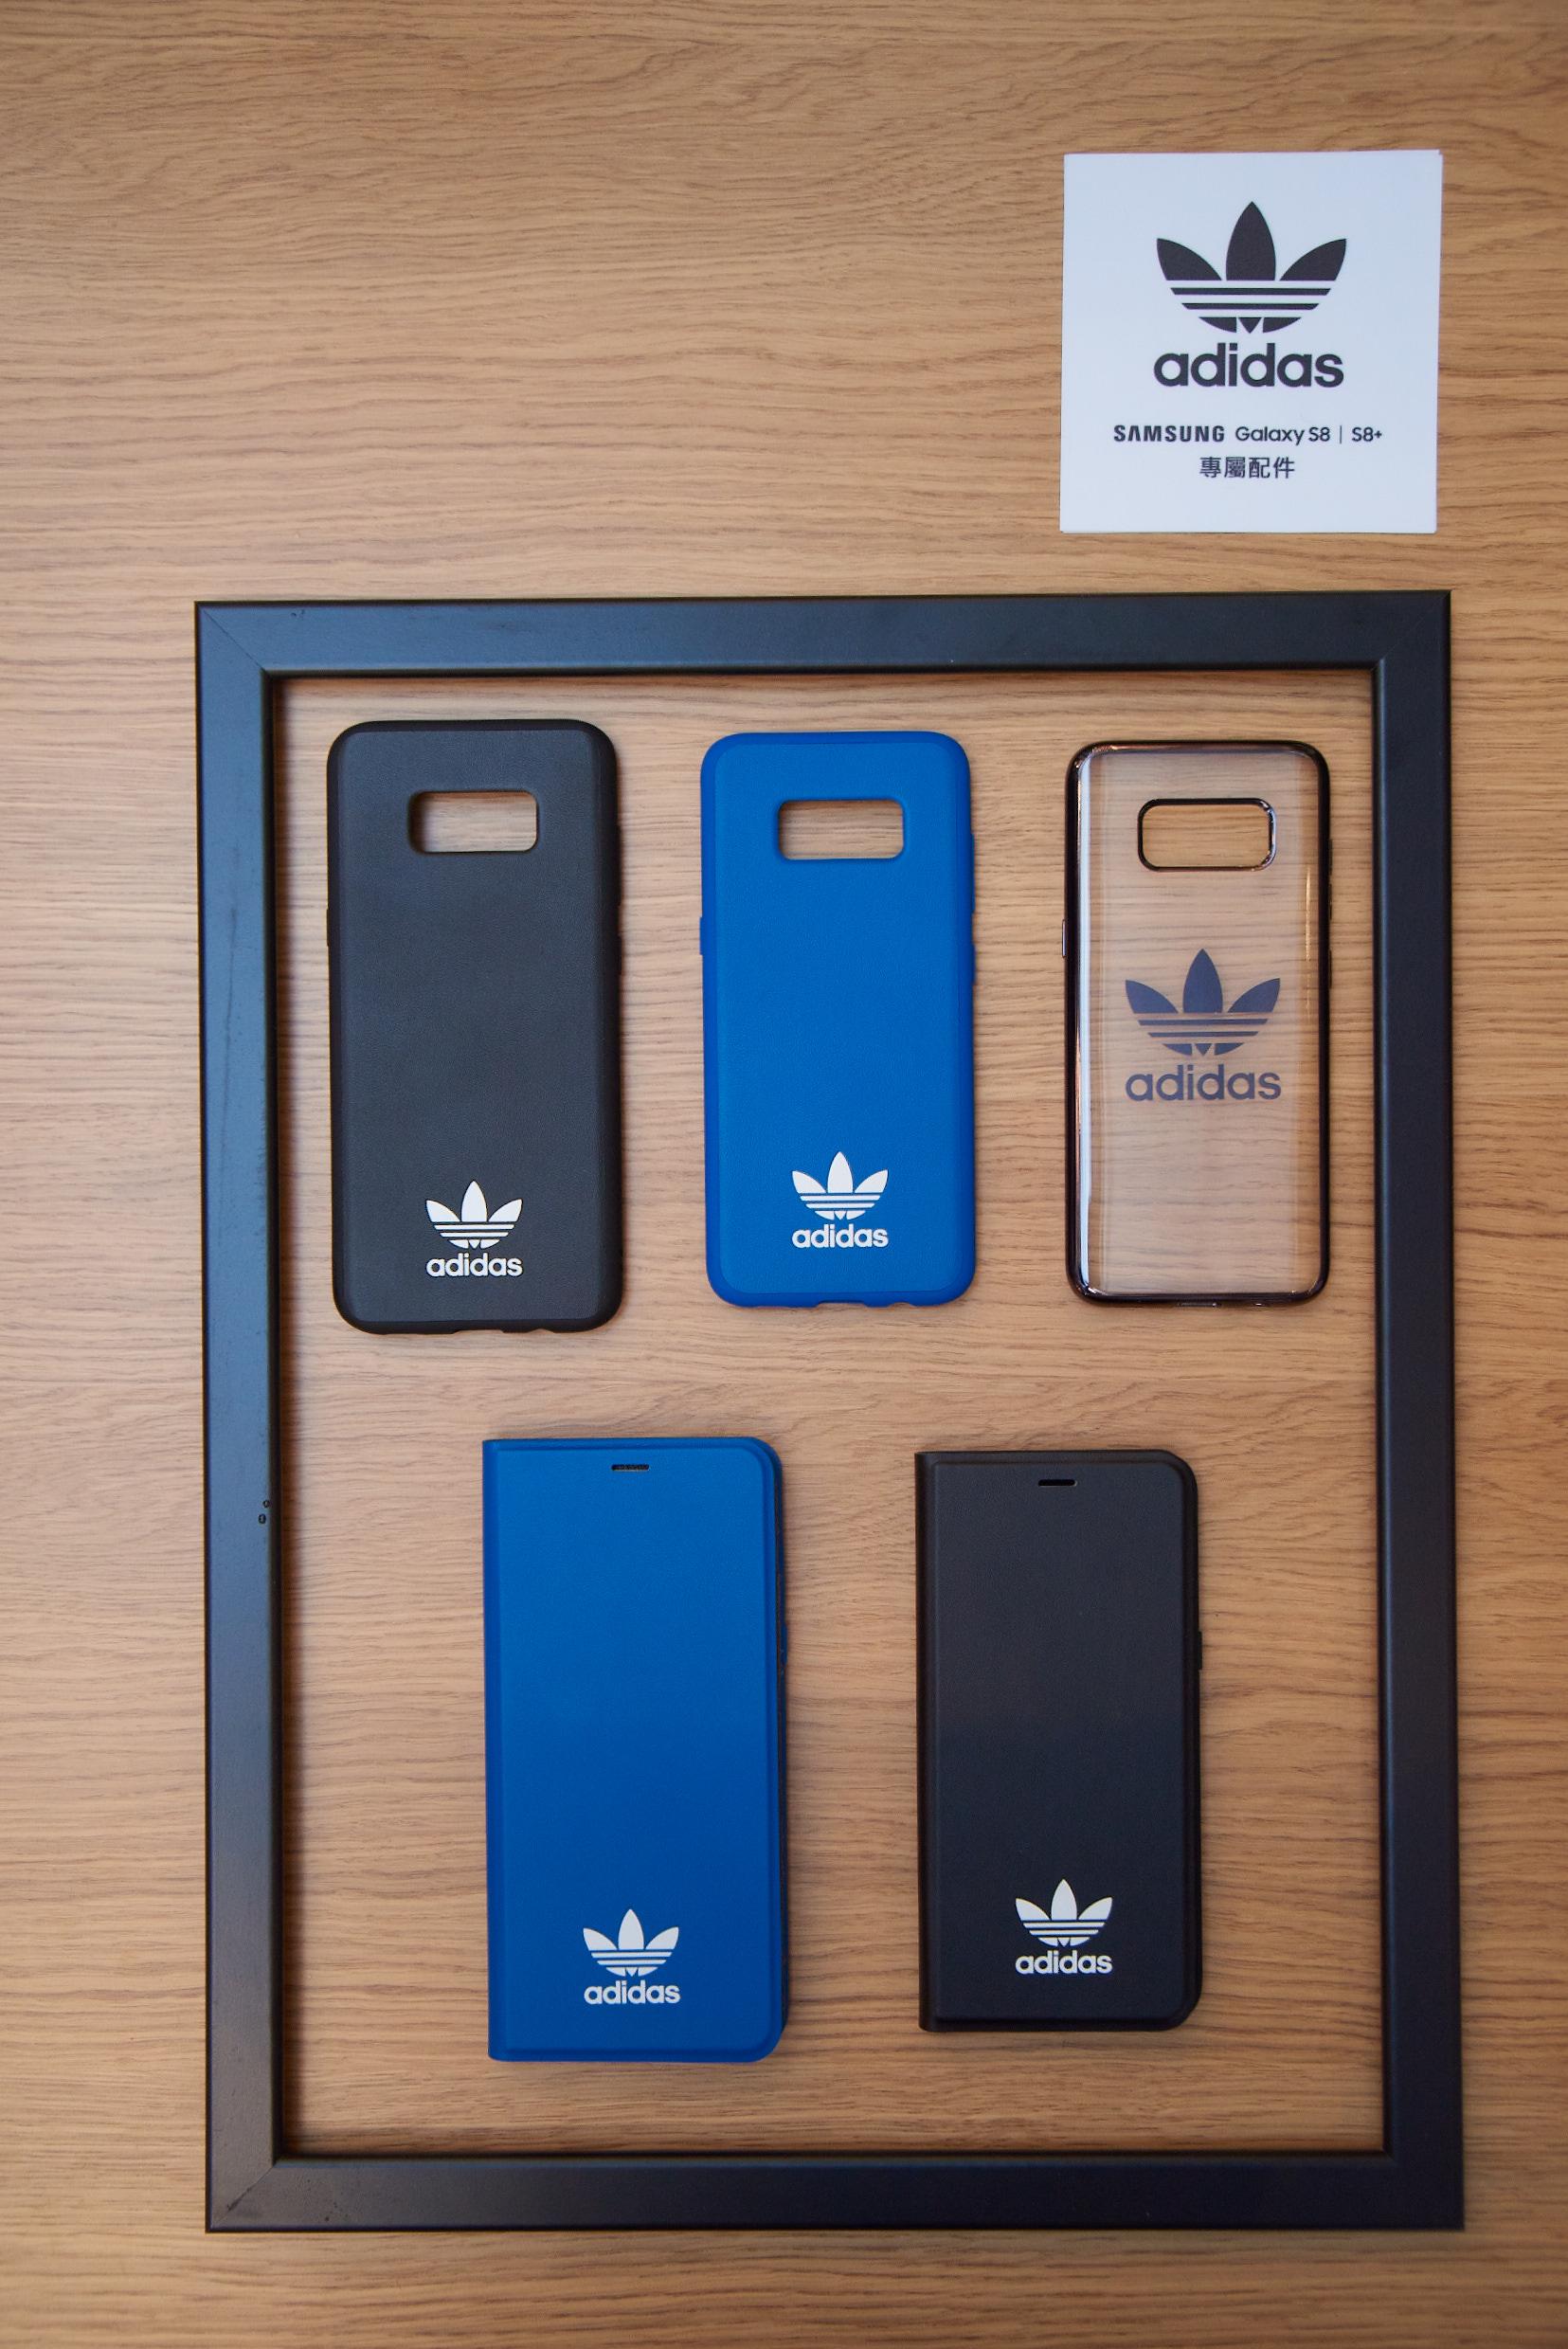 Samsung Galaxy S8、S8+上市資訊公開!建議售價NT$24,900起